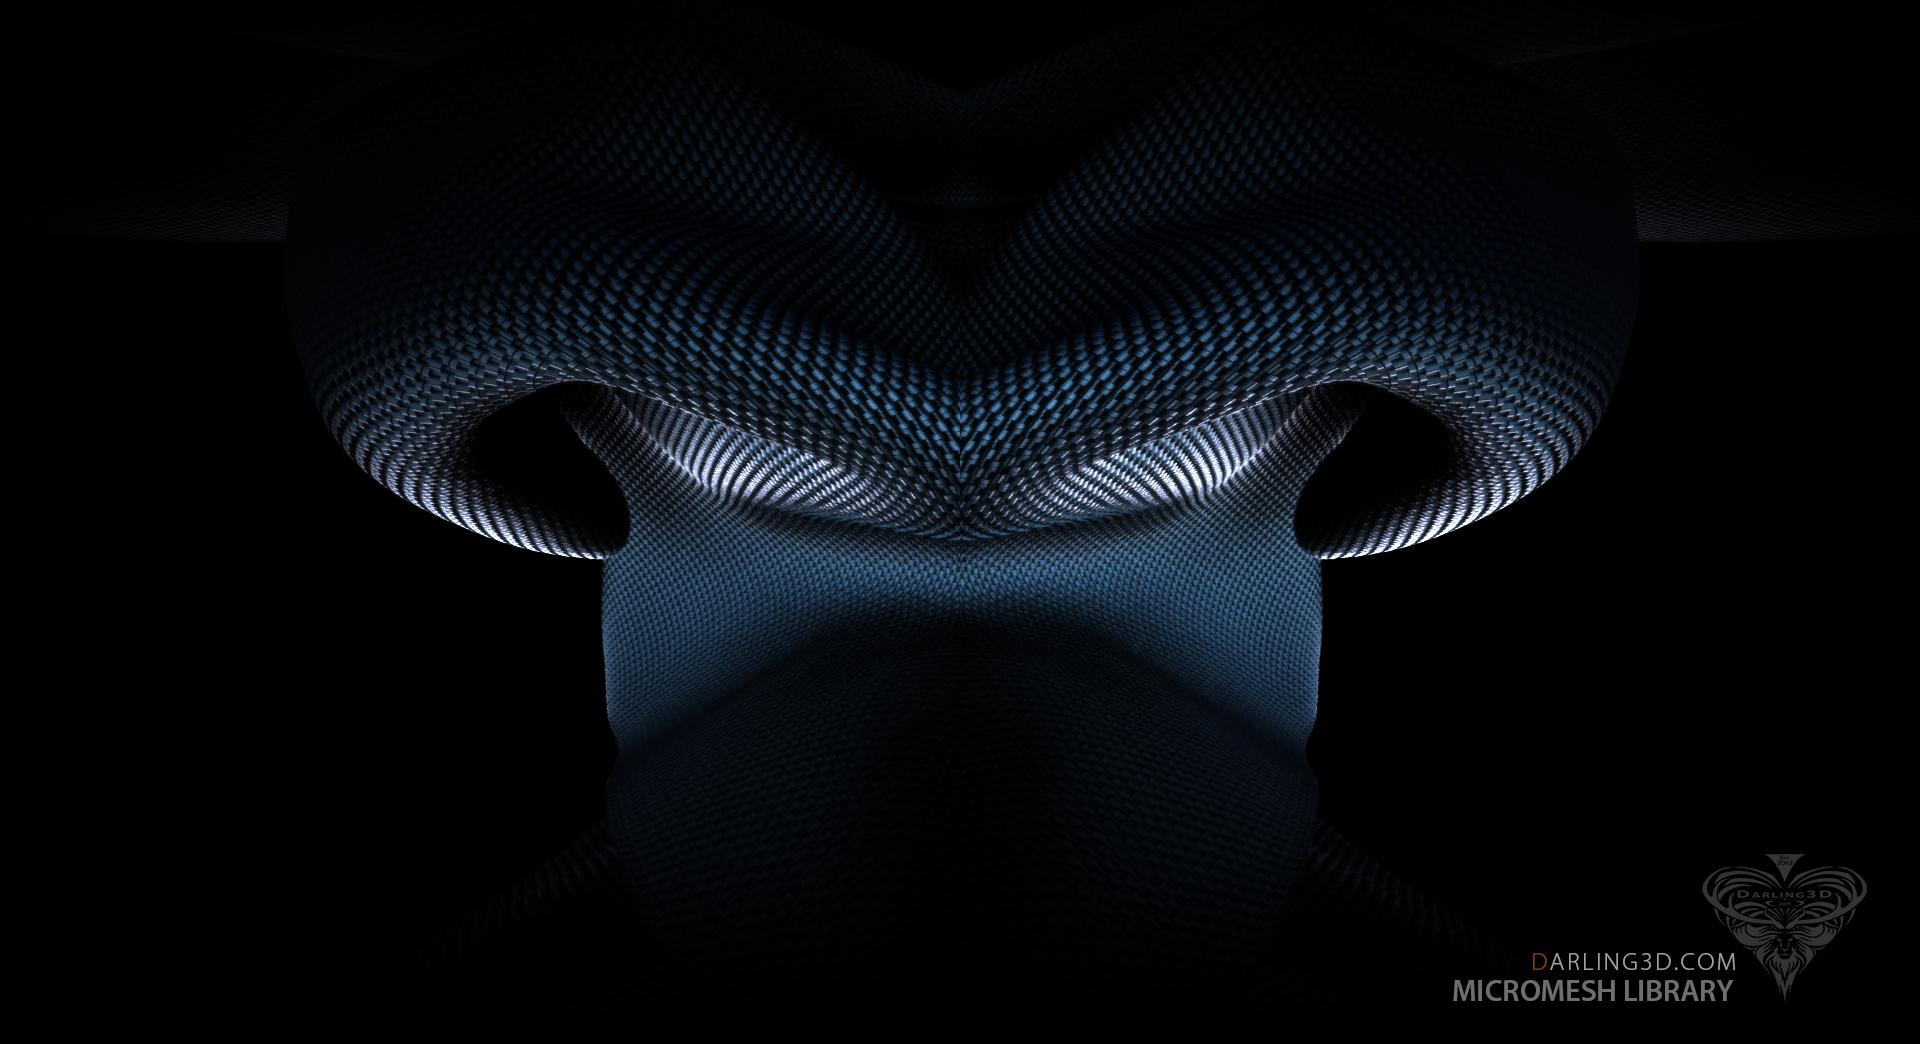 Micromesh_Desktop Background_06.jpg